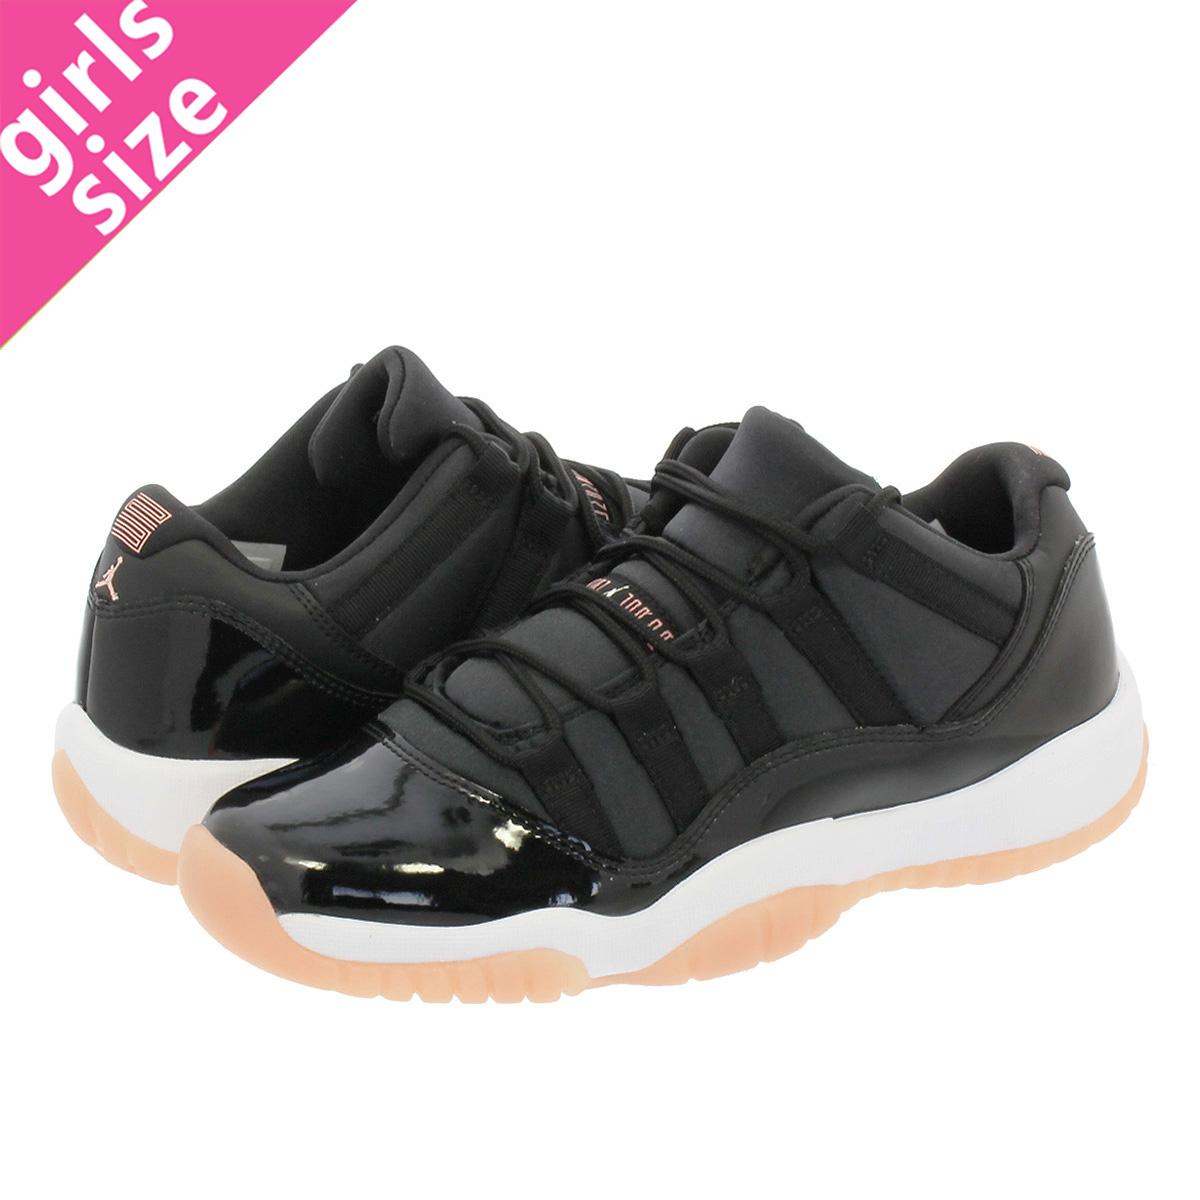 be00ea32f74 SELECT SHOP LOWTEX: NIKE AIR JORDAN 11 RETRO LOW GG Nike Air Jordan 11  nostalgic low BG BLACK/BLEACHED CORAL/WHITE 580,521-013 | Rakuten Global  Market